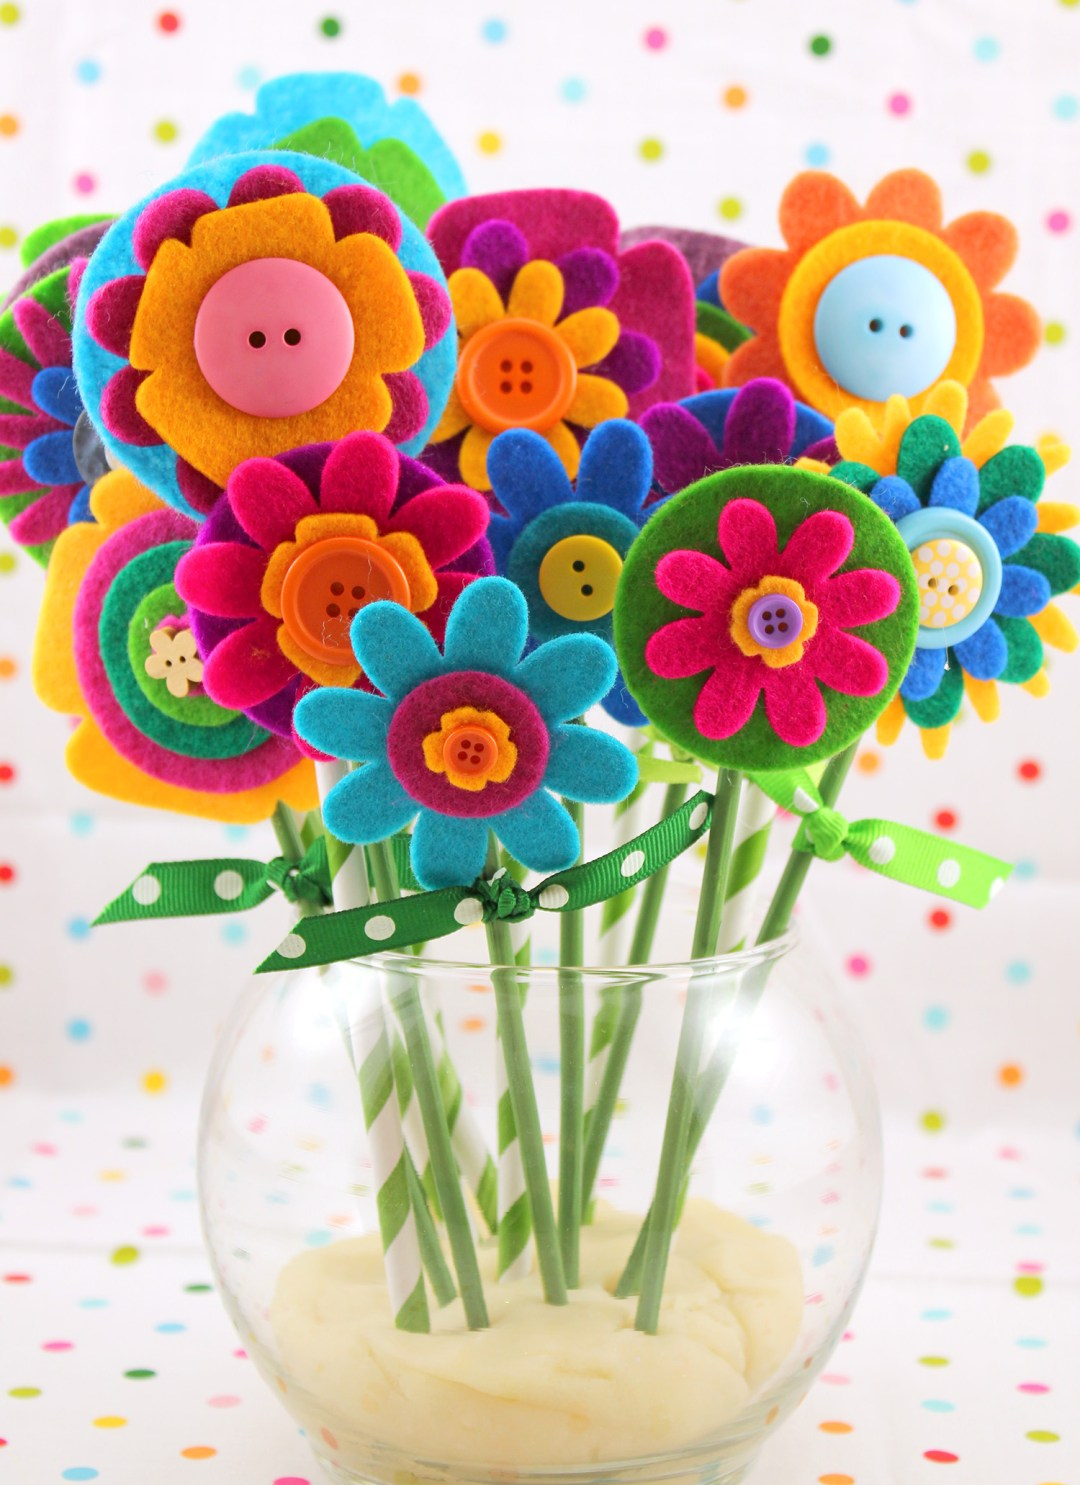 Colorful Felt Flowers